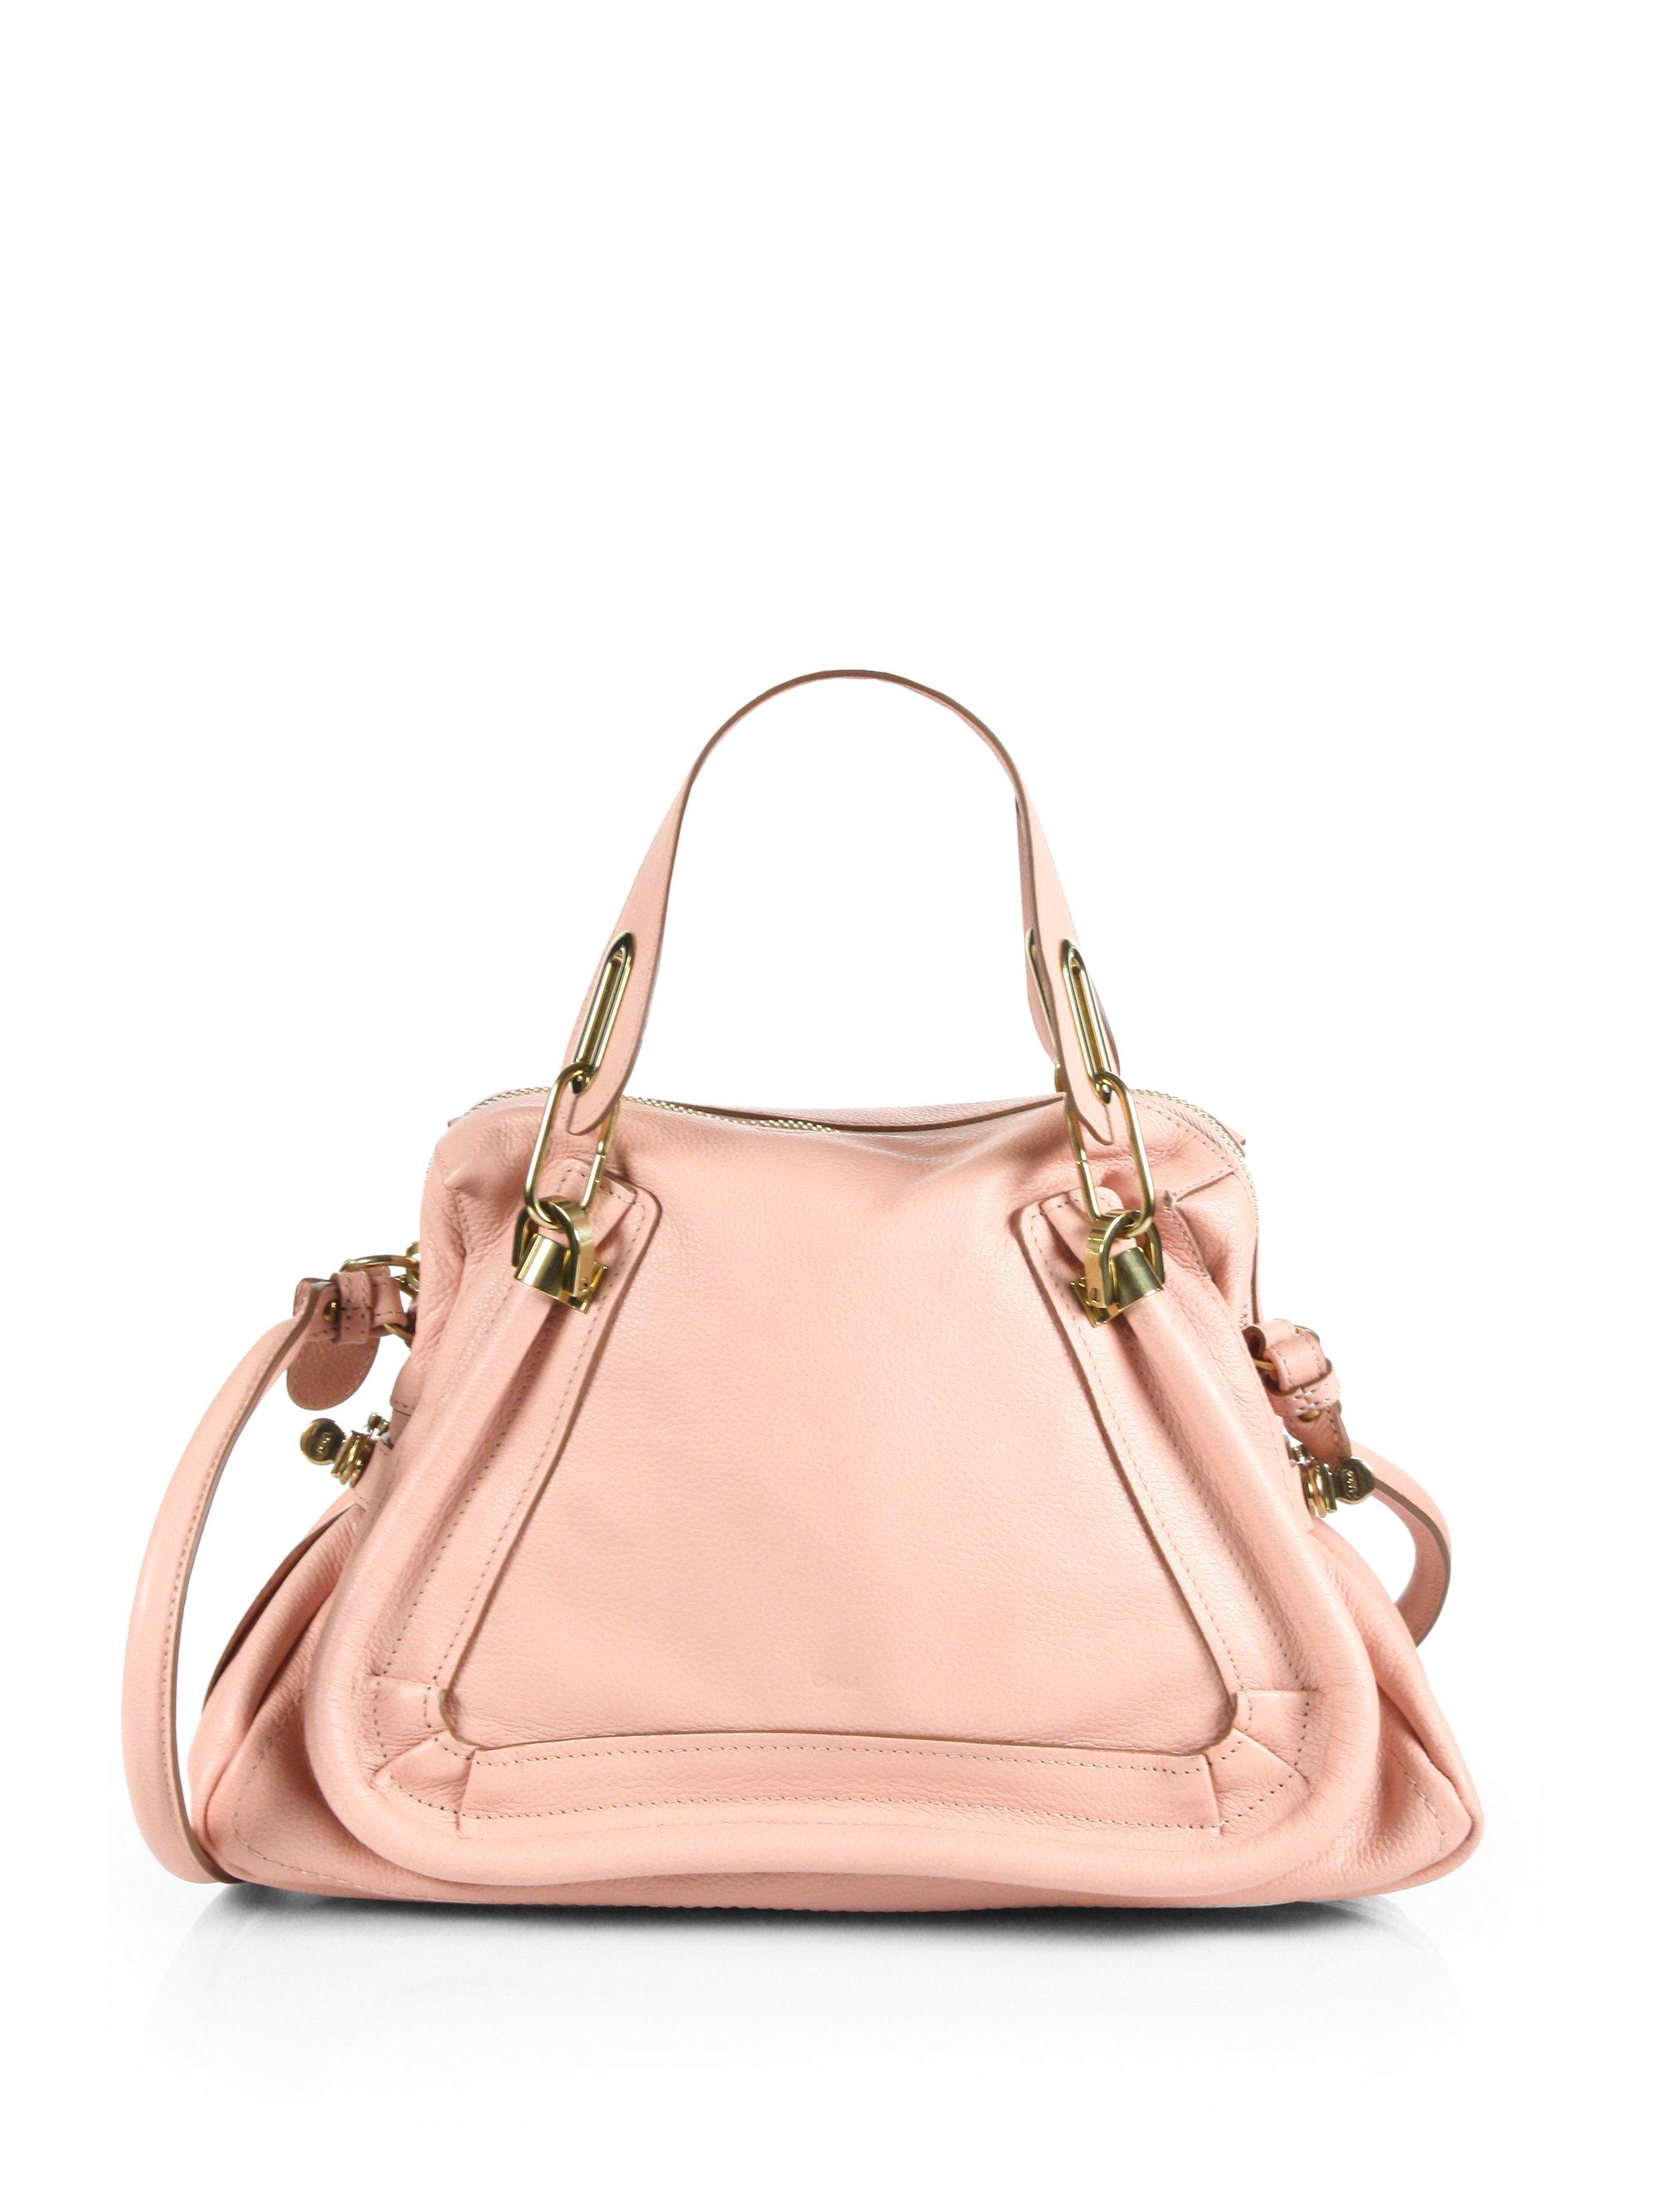 Chlo¨¦ Paraty | Shop Chlo¨¦ Paraty Bags On Lyst